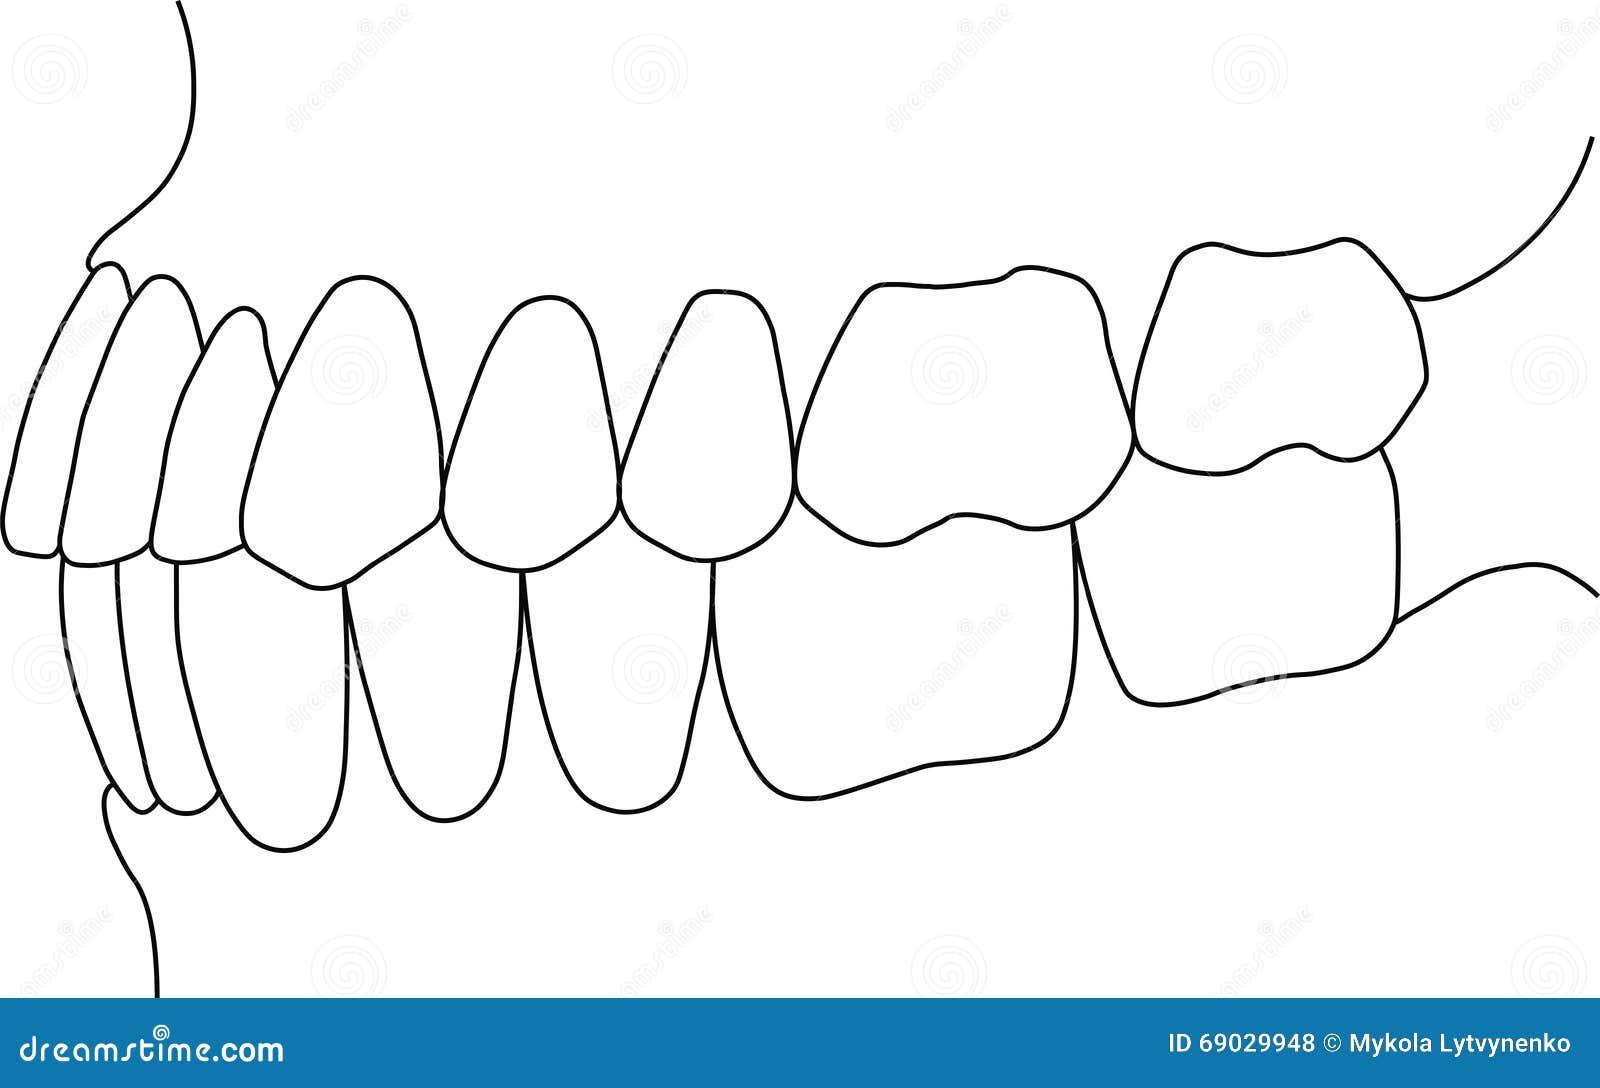 dental occlusion molars teeth close up royalty